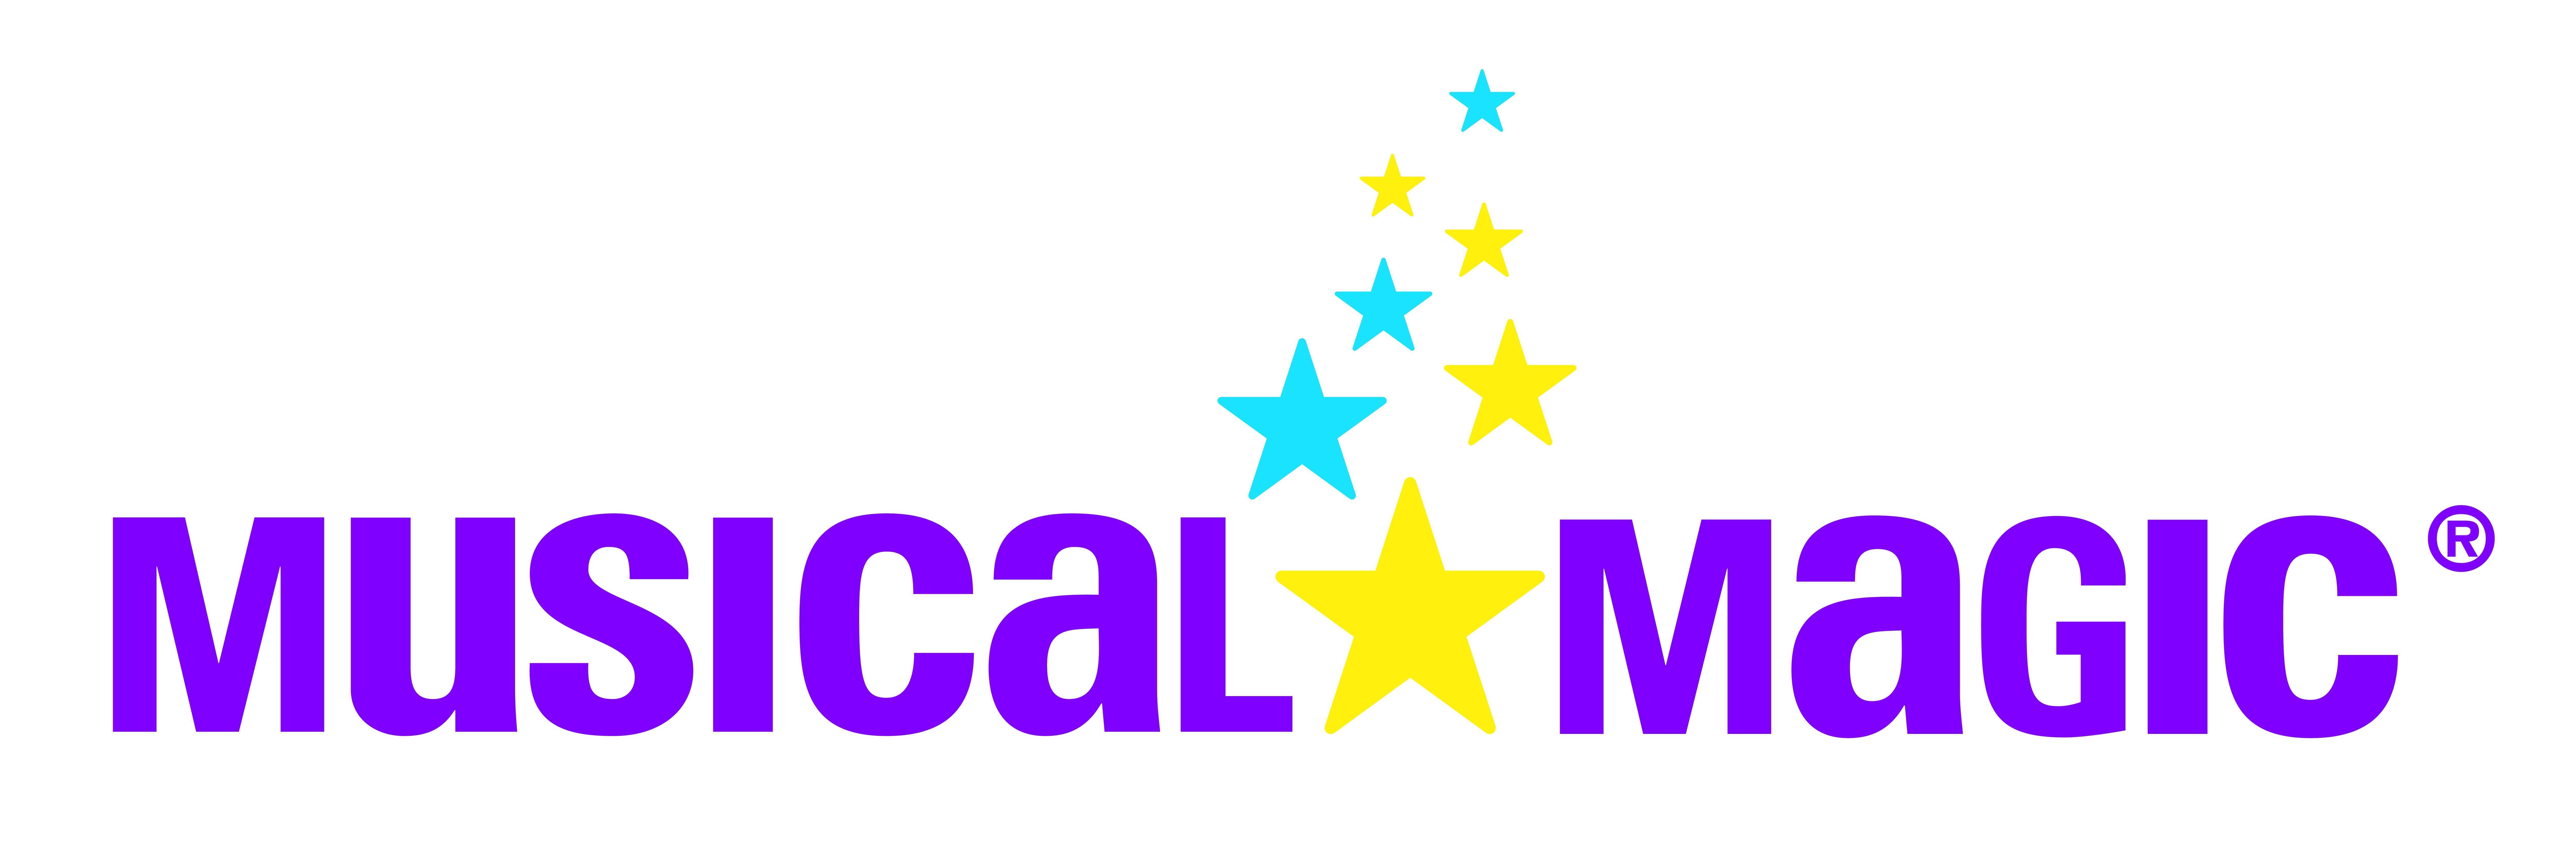 Mm+logo